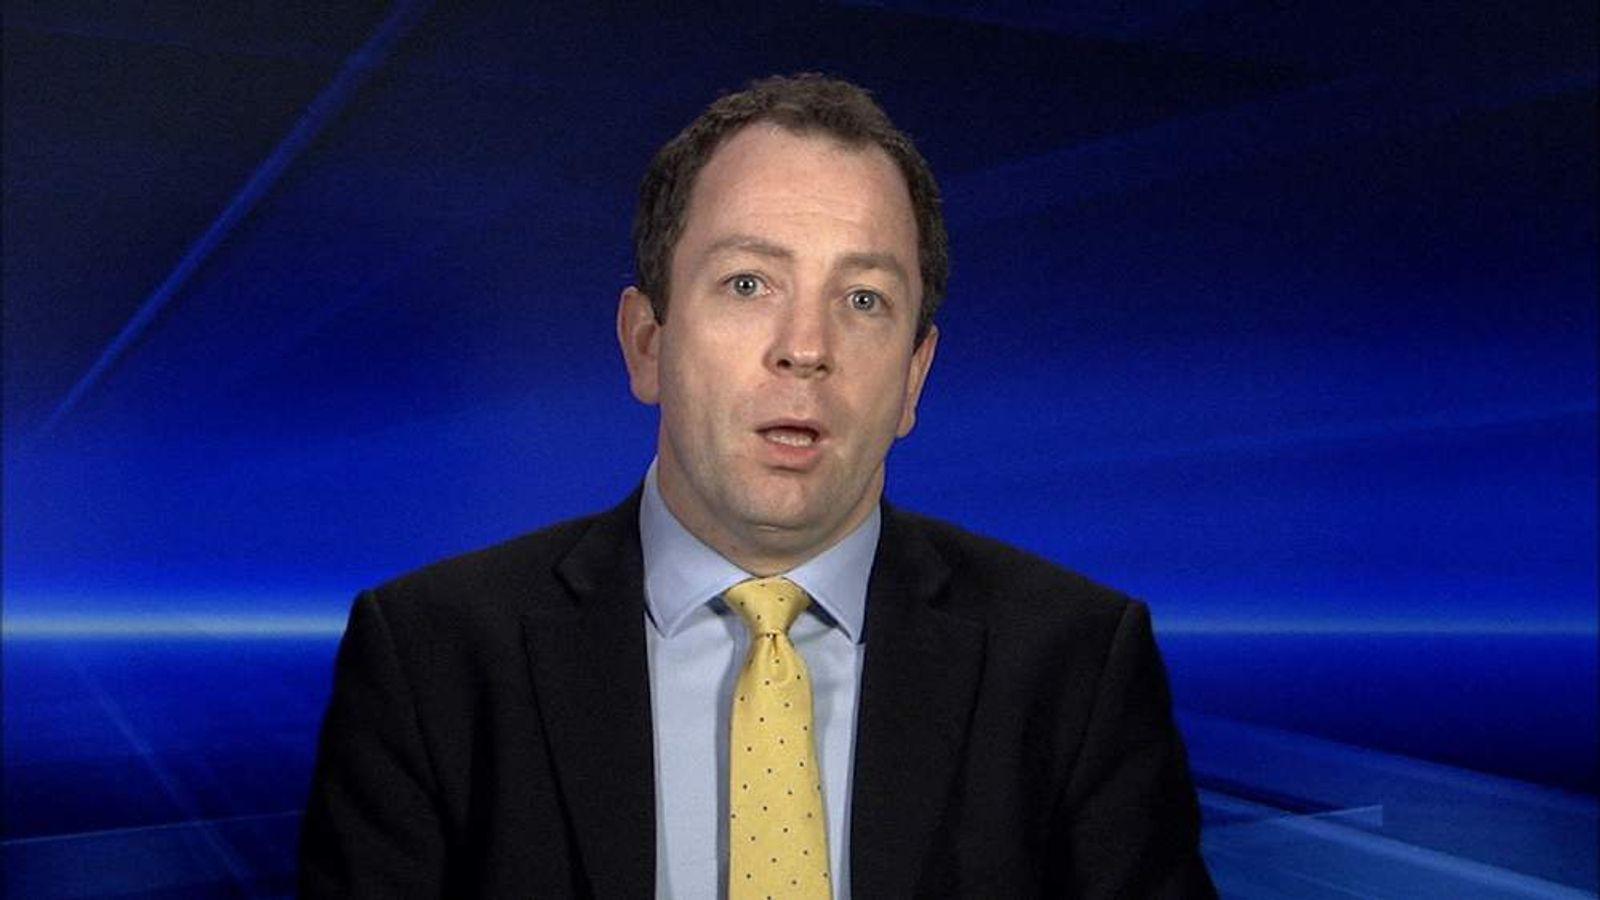 Association of British Insurers Assistant Director Aidan Kerr